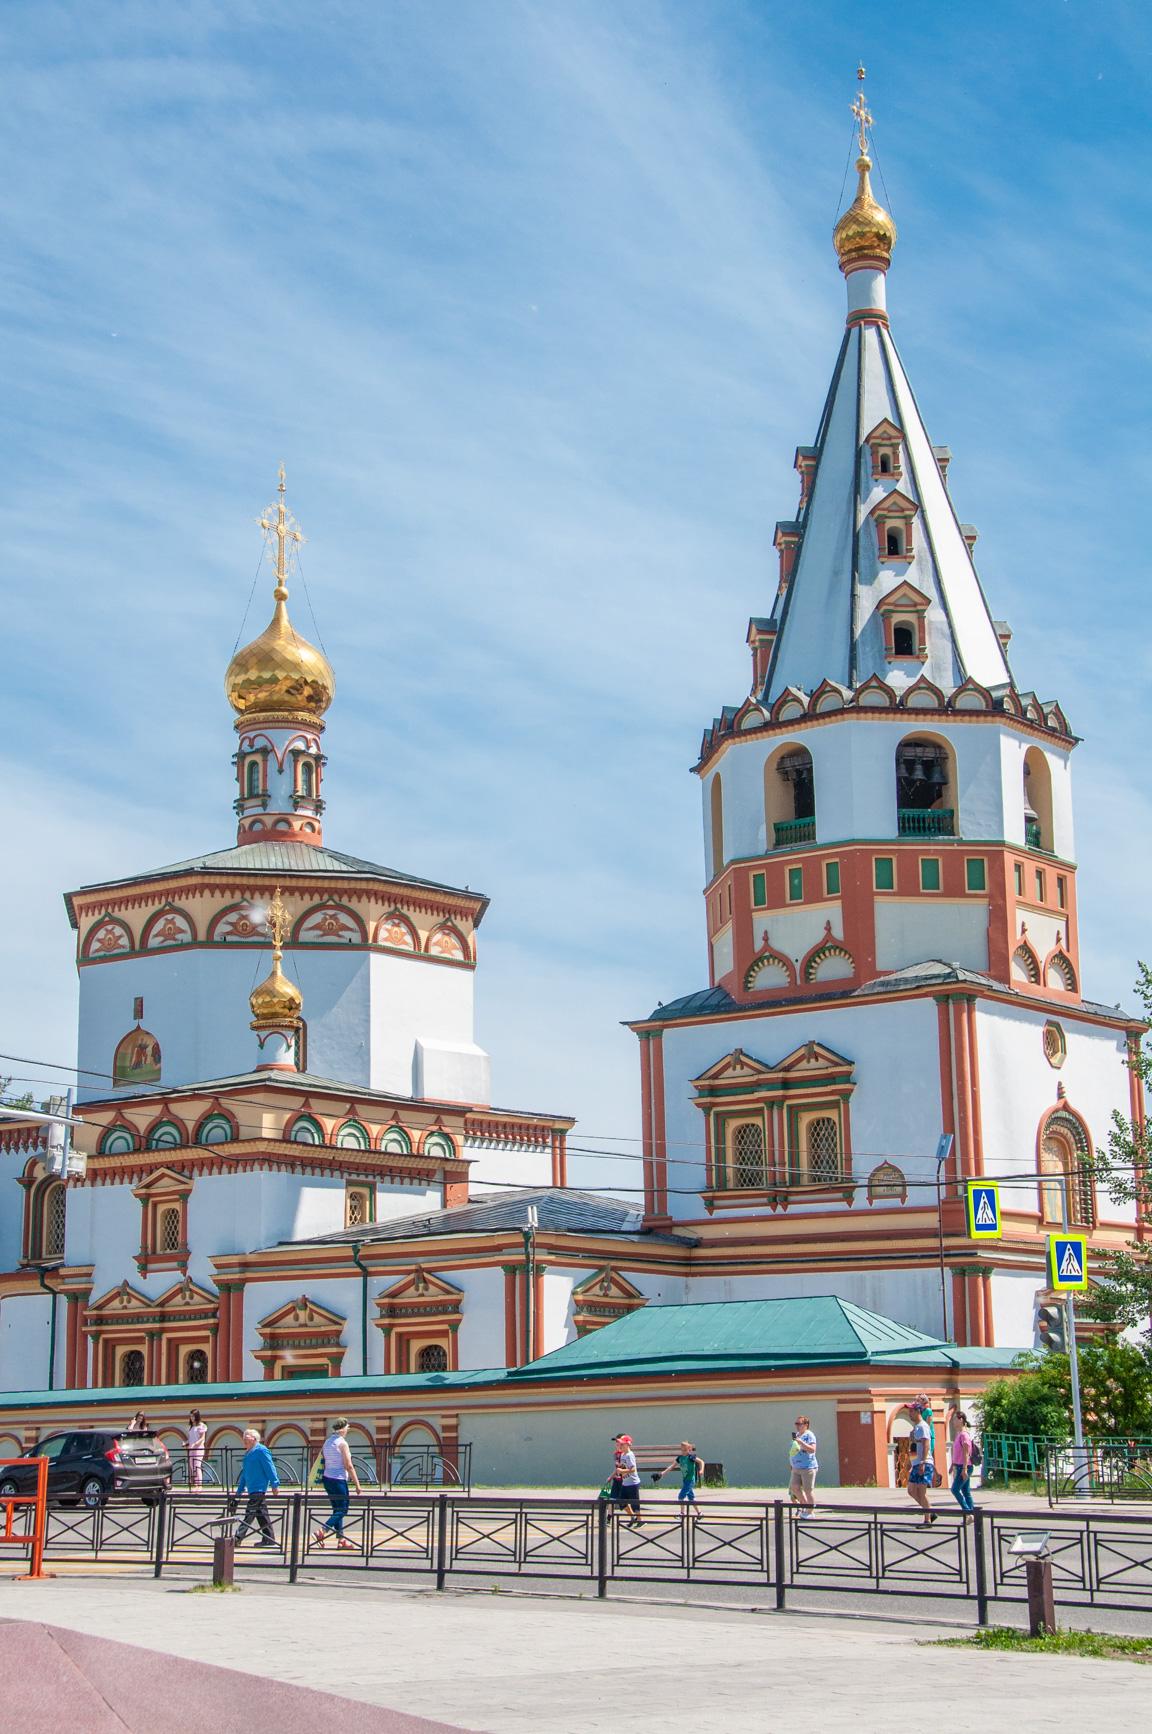 https://bubo.sk/uploads/galleries/7219/tomaskubus_rusko_irkutsk_kostolzvestovania2_transsib.jpg